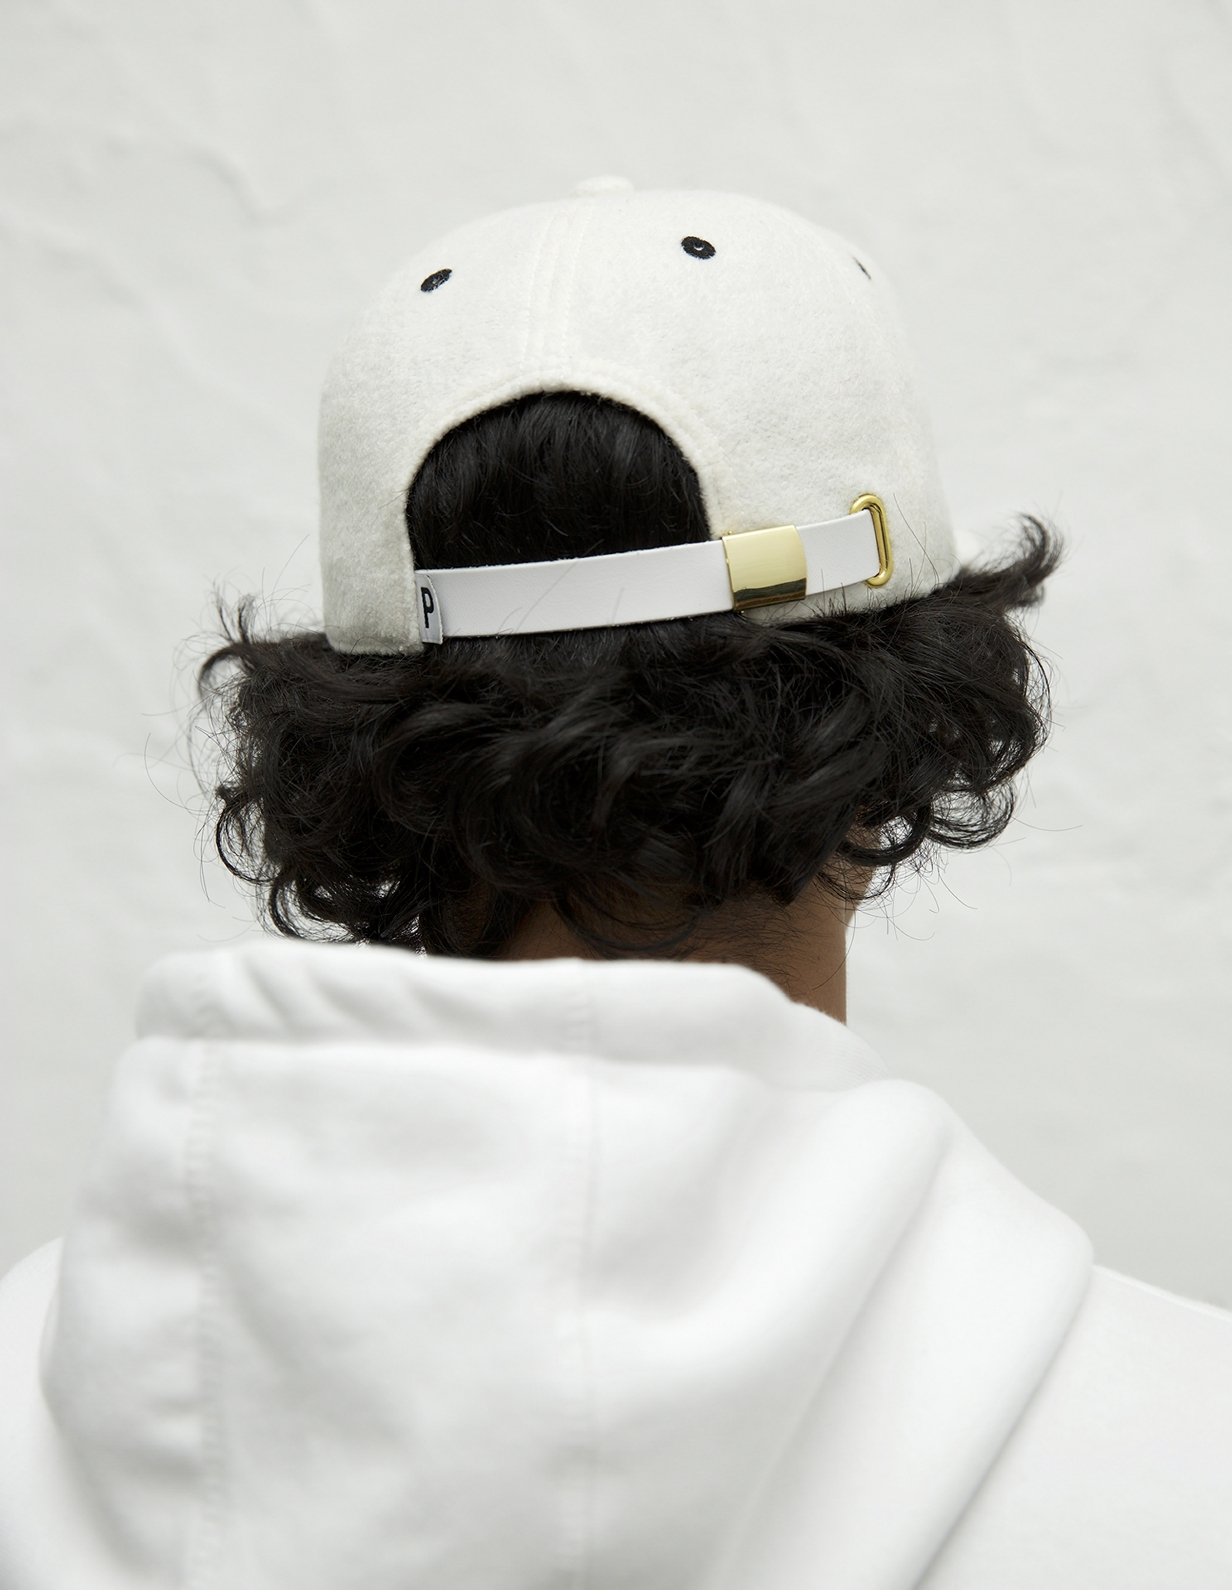 【PAS DE MER/パドゥメ】B.O.V. CAP キャップ / WHITE